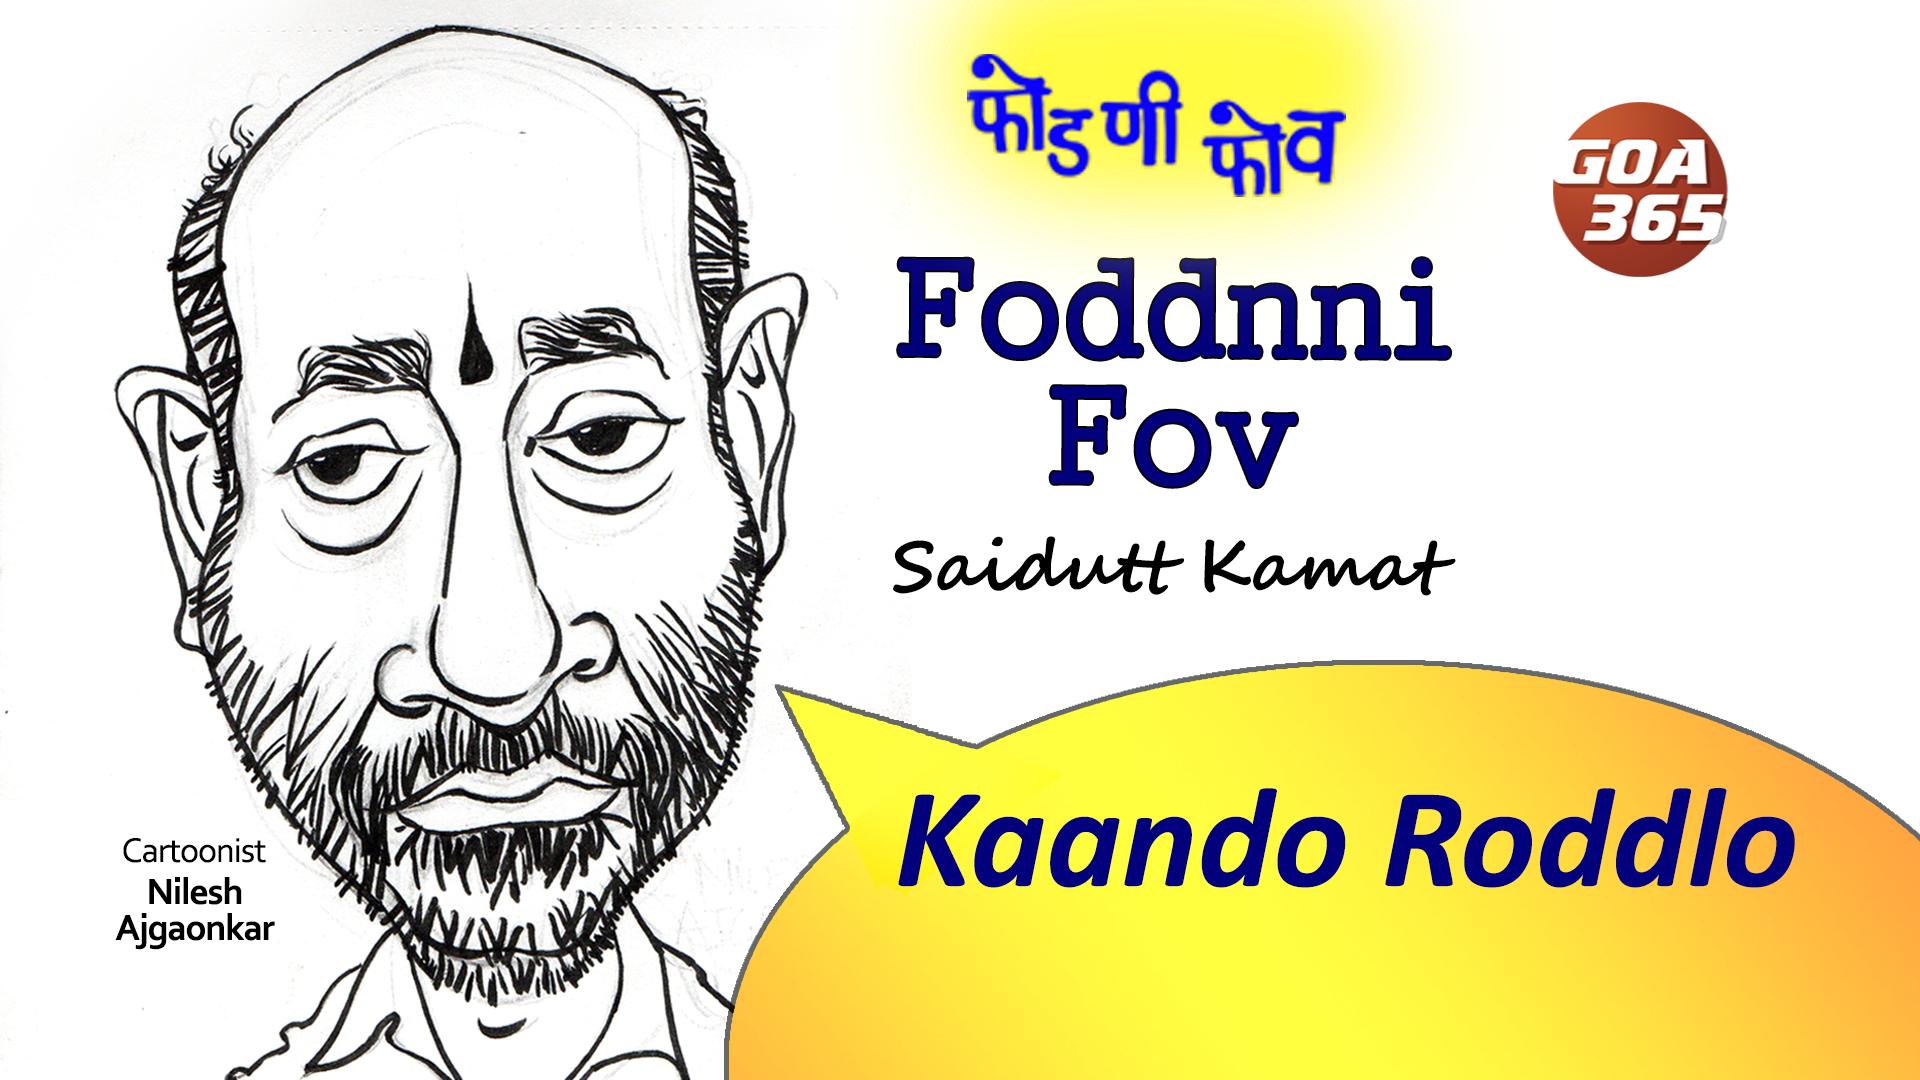 #FODDNNI_FOV : Kaando Roddlo